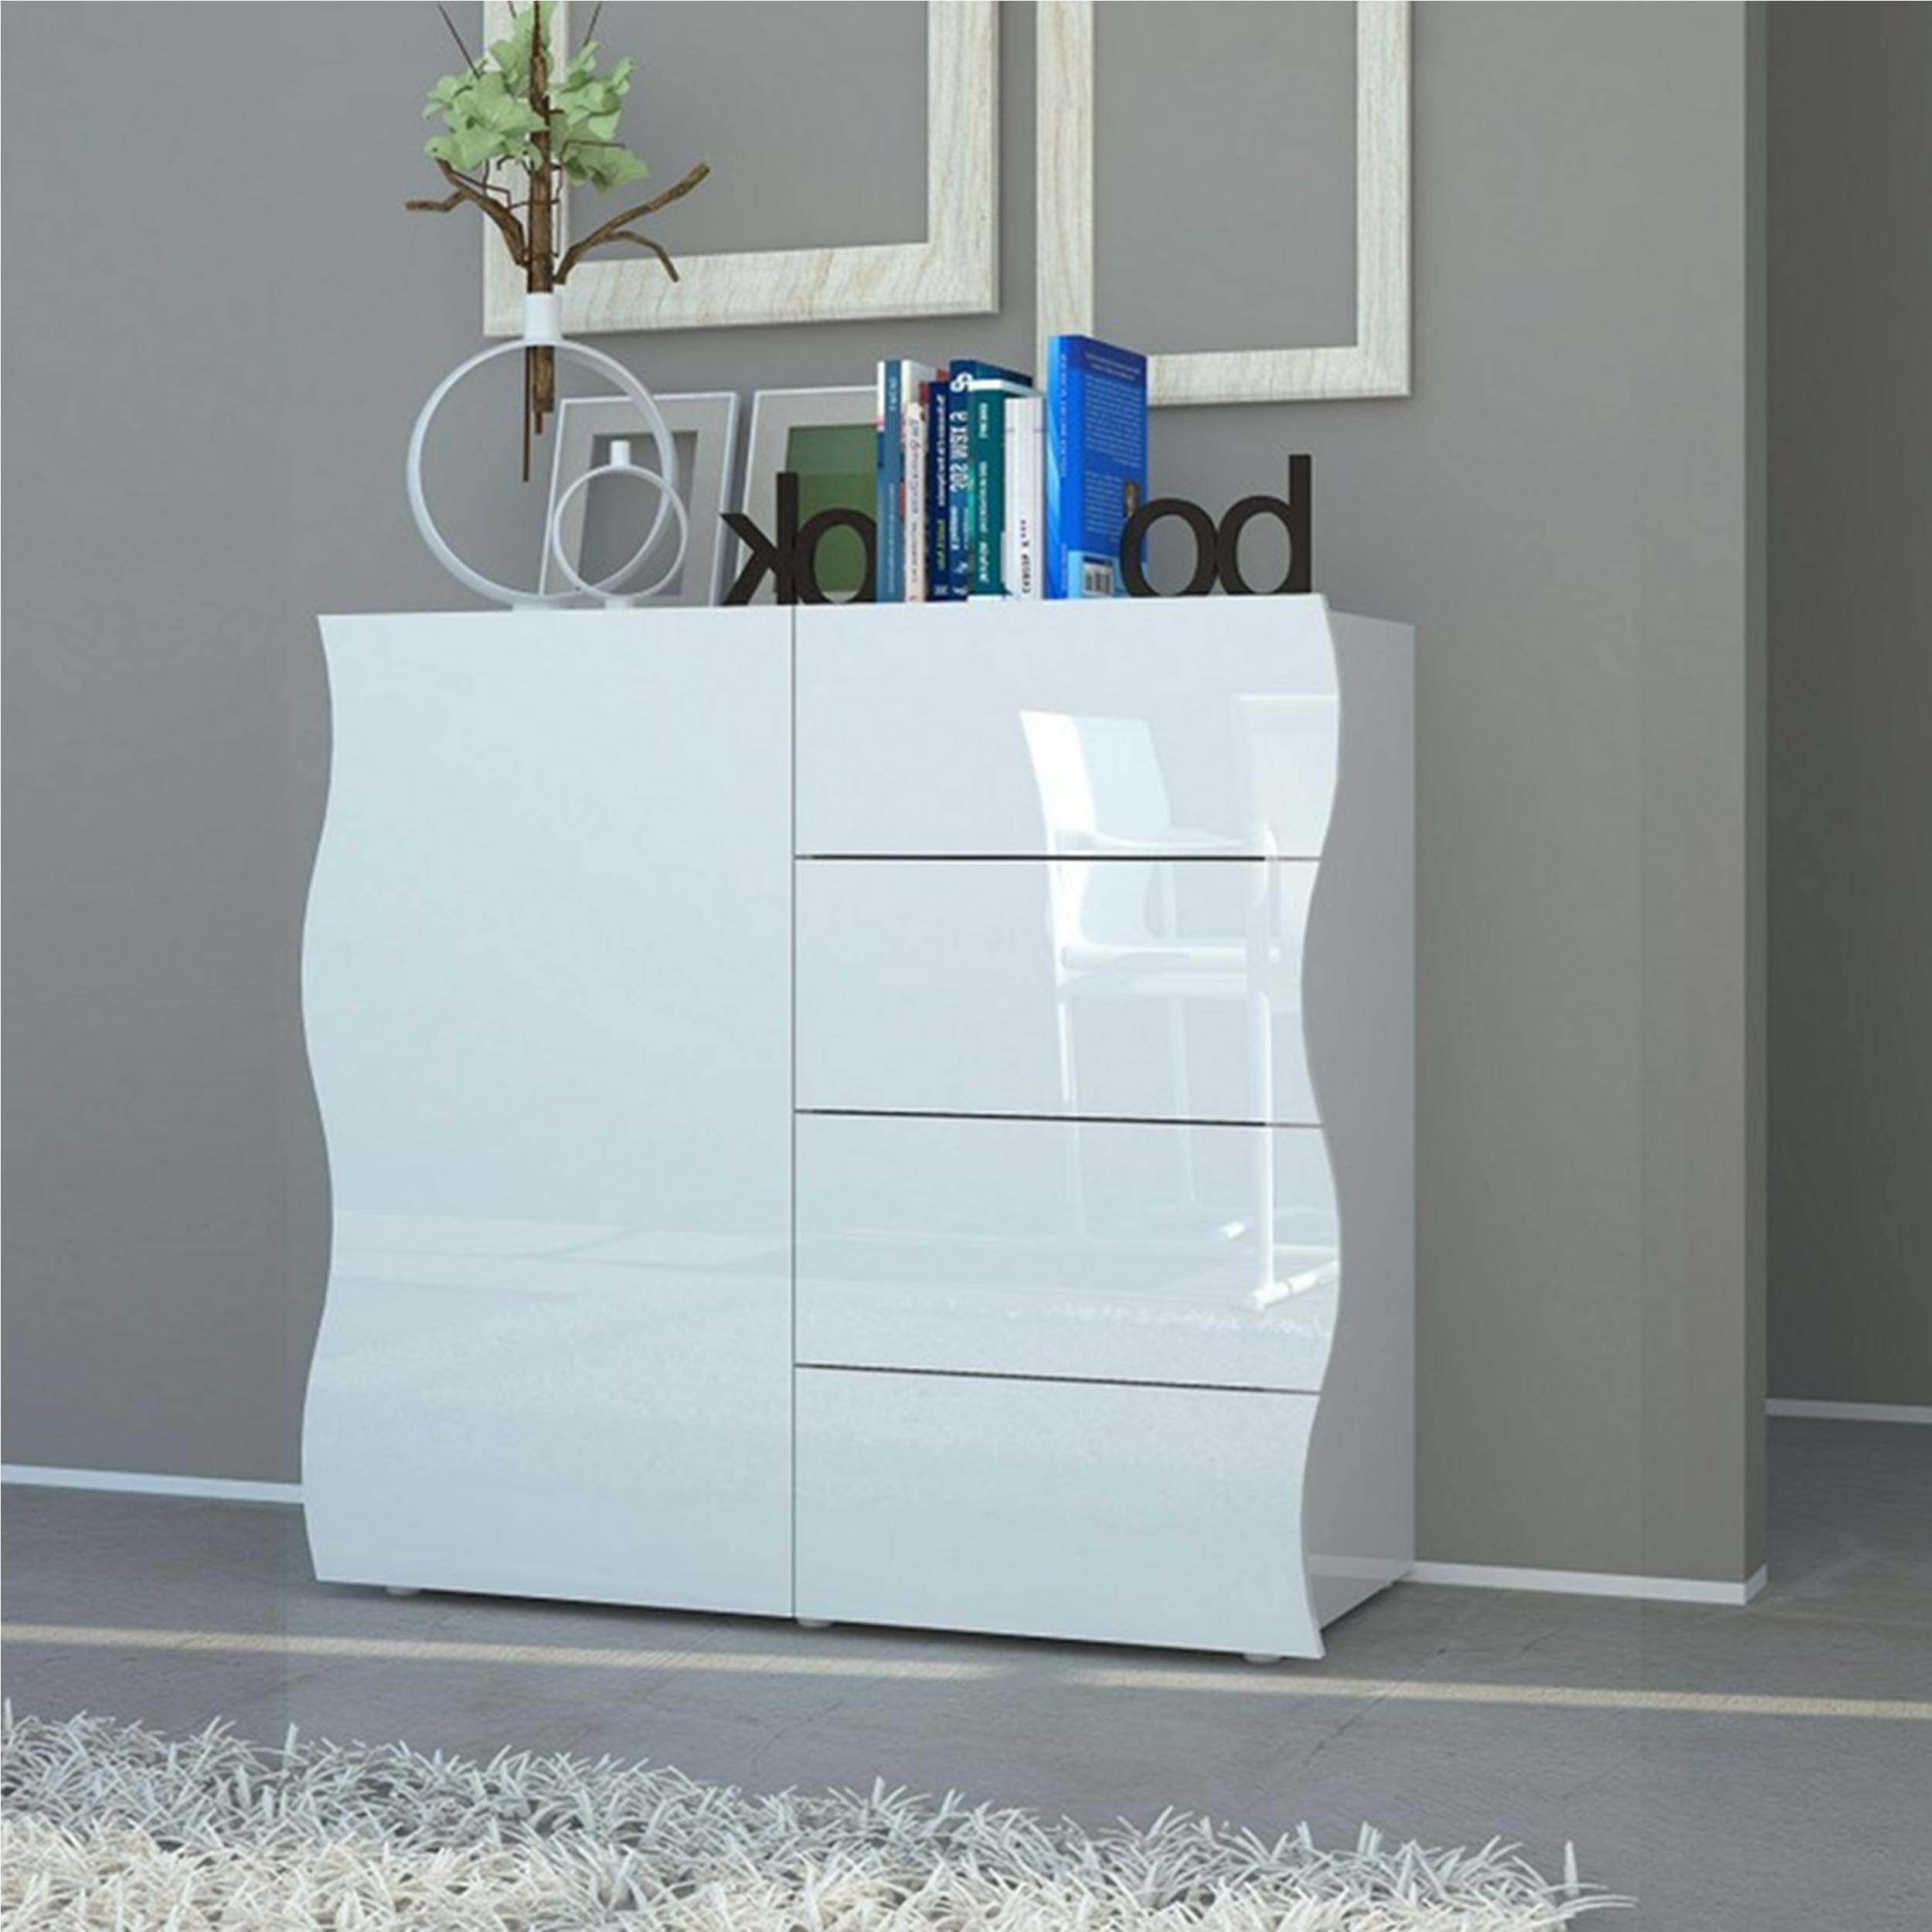 Mobile onda 4 cassetti 1 anta 90x40xh81 2 cm bianco for Mobile bianco cucina